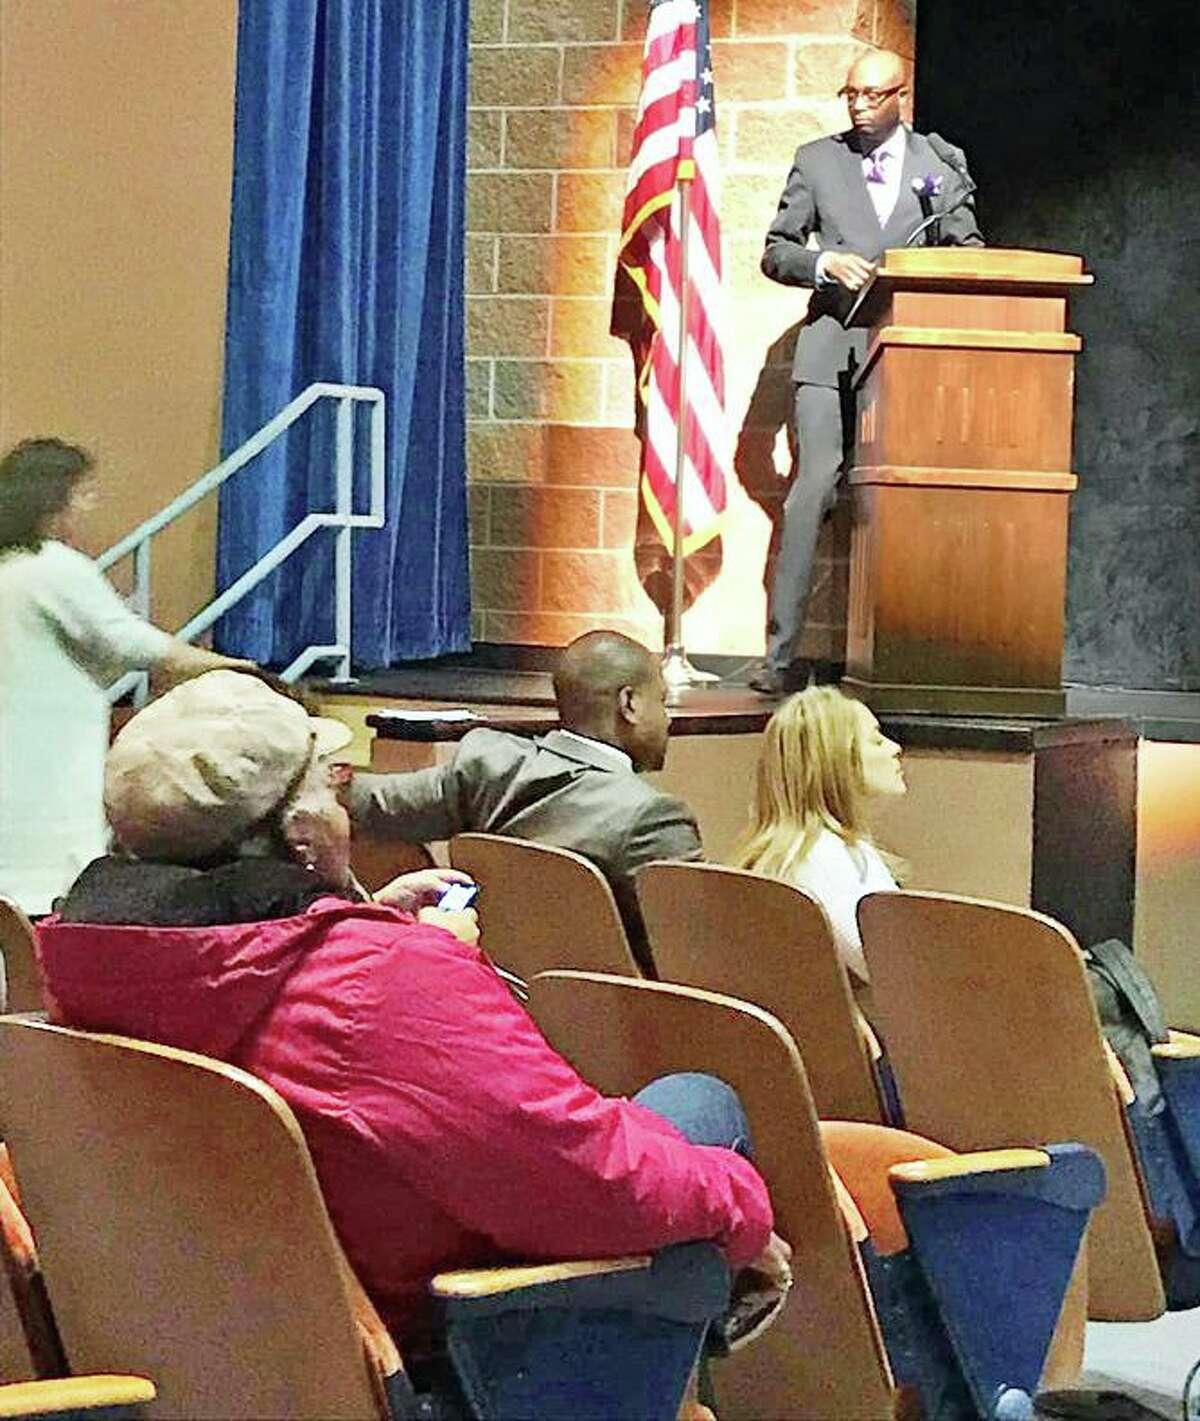 Channel 8 News investigative reporter Mario Boone moderates Thursday's mayoral debate between Democrat Ben Florsheim and Middletown Council Minority Leader, Republican Sebastian N. Giuliano.